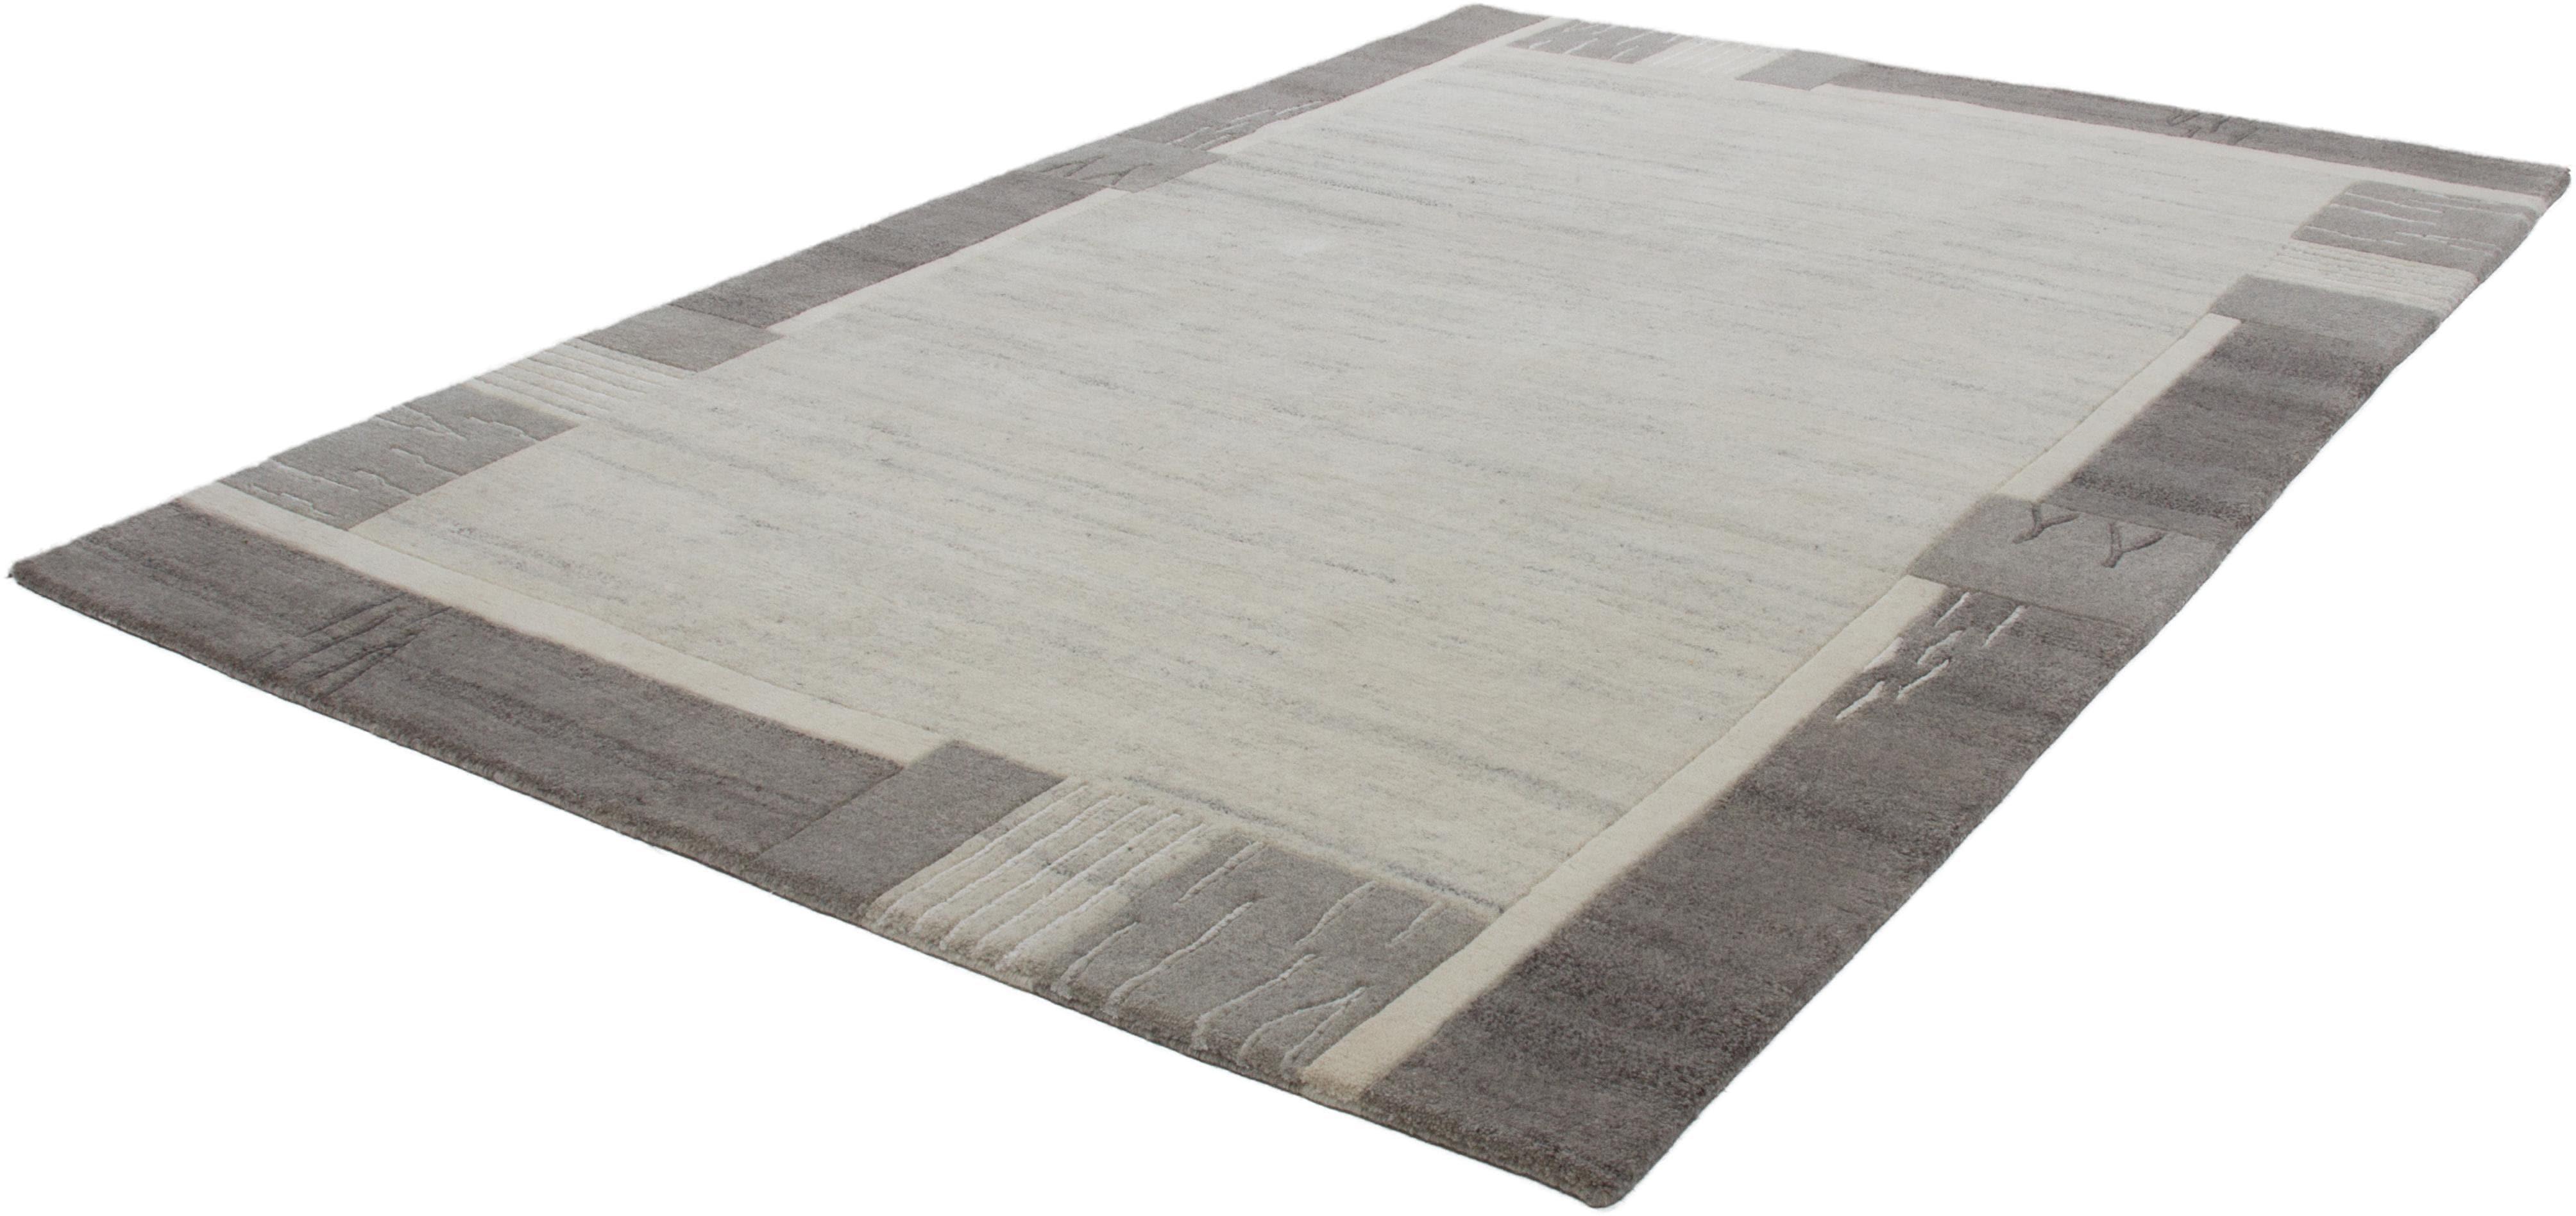 Teppich Goa 950 LALEE rechteckig Höhe 18 mm